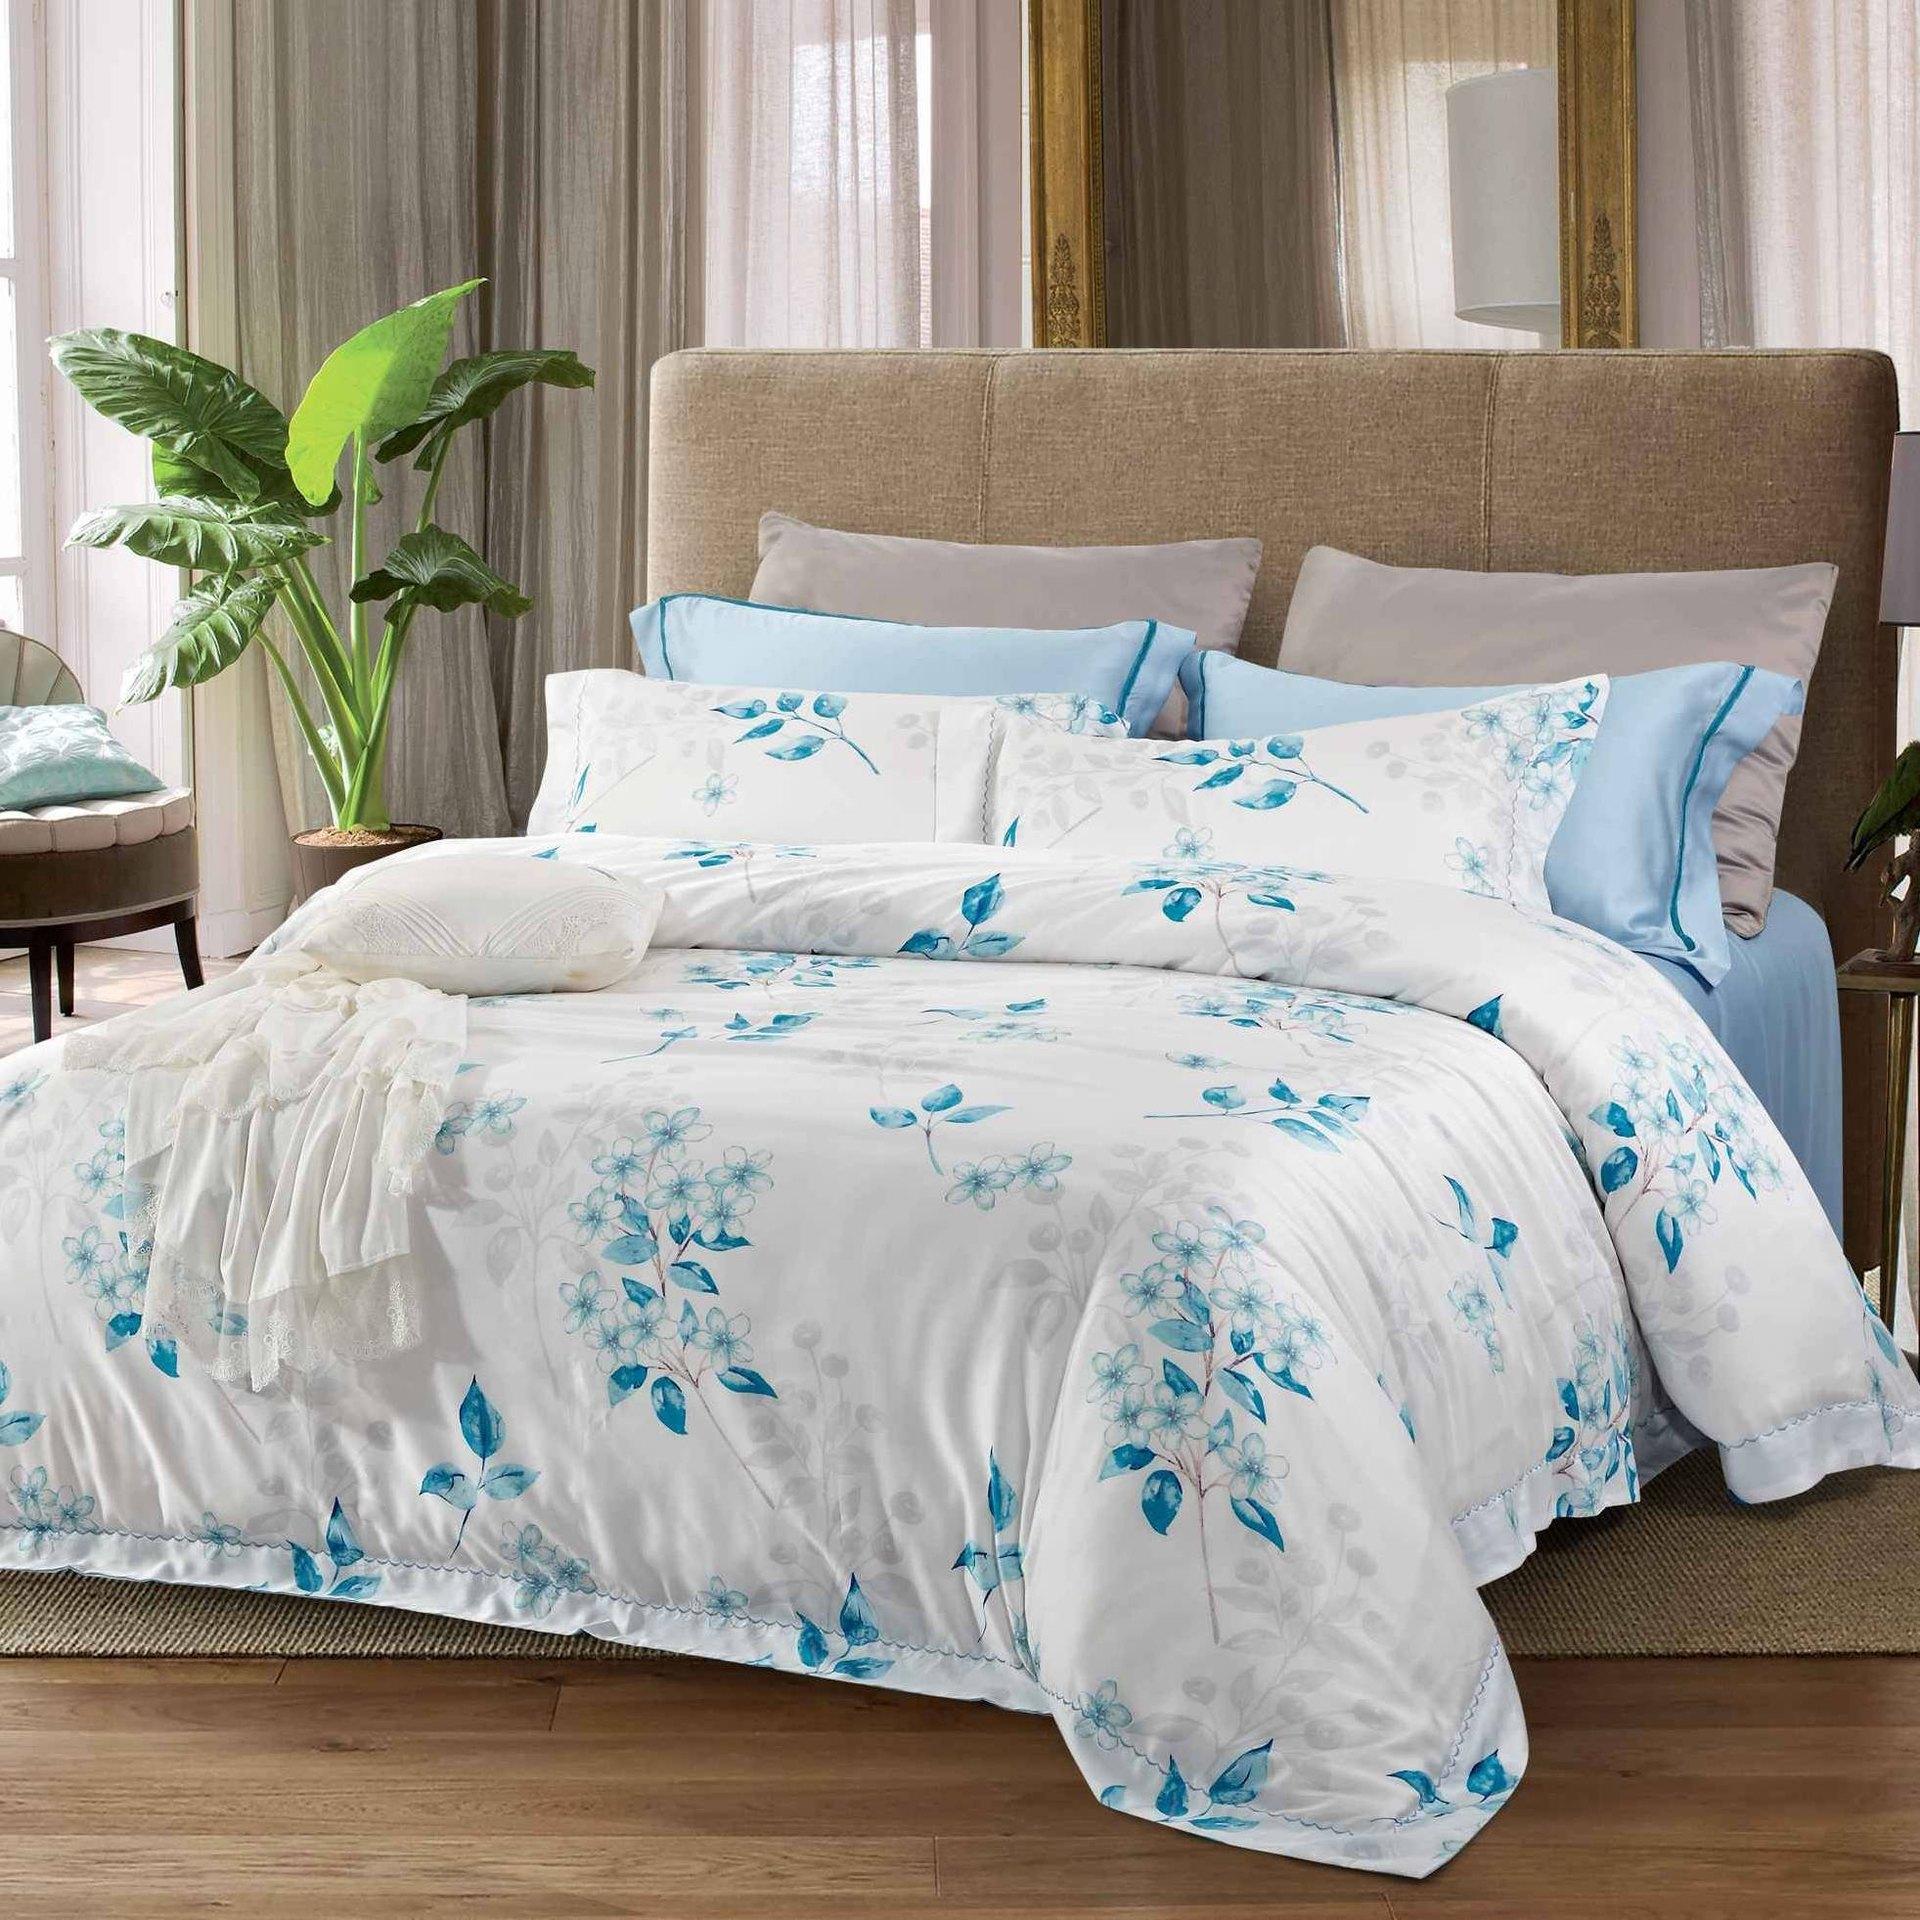 Fresh Plant Motif Sky Blue Bedding Set 171076